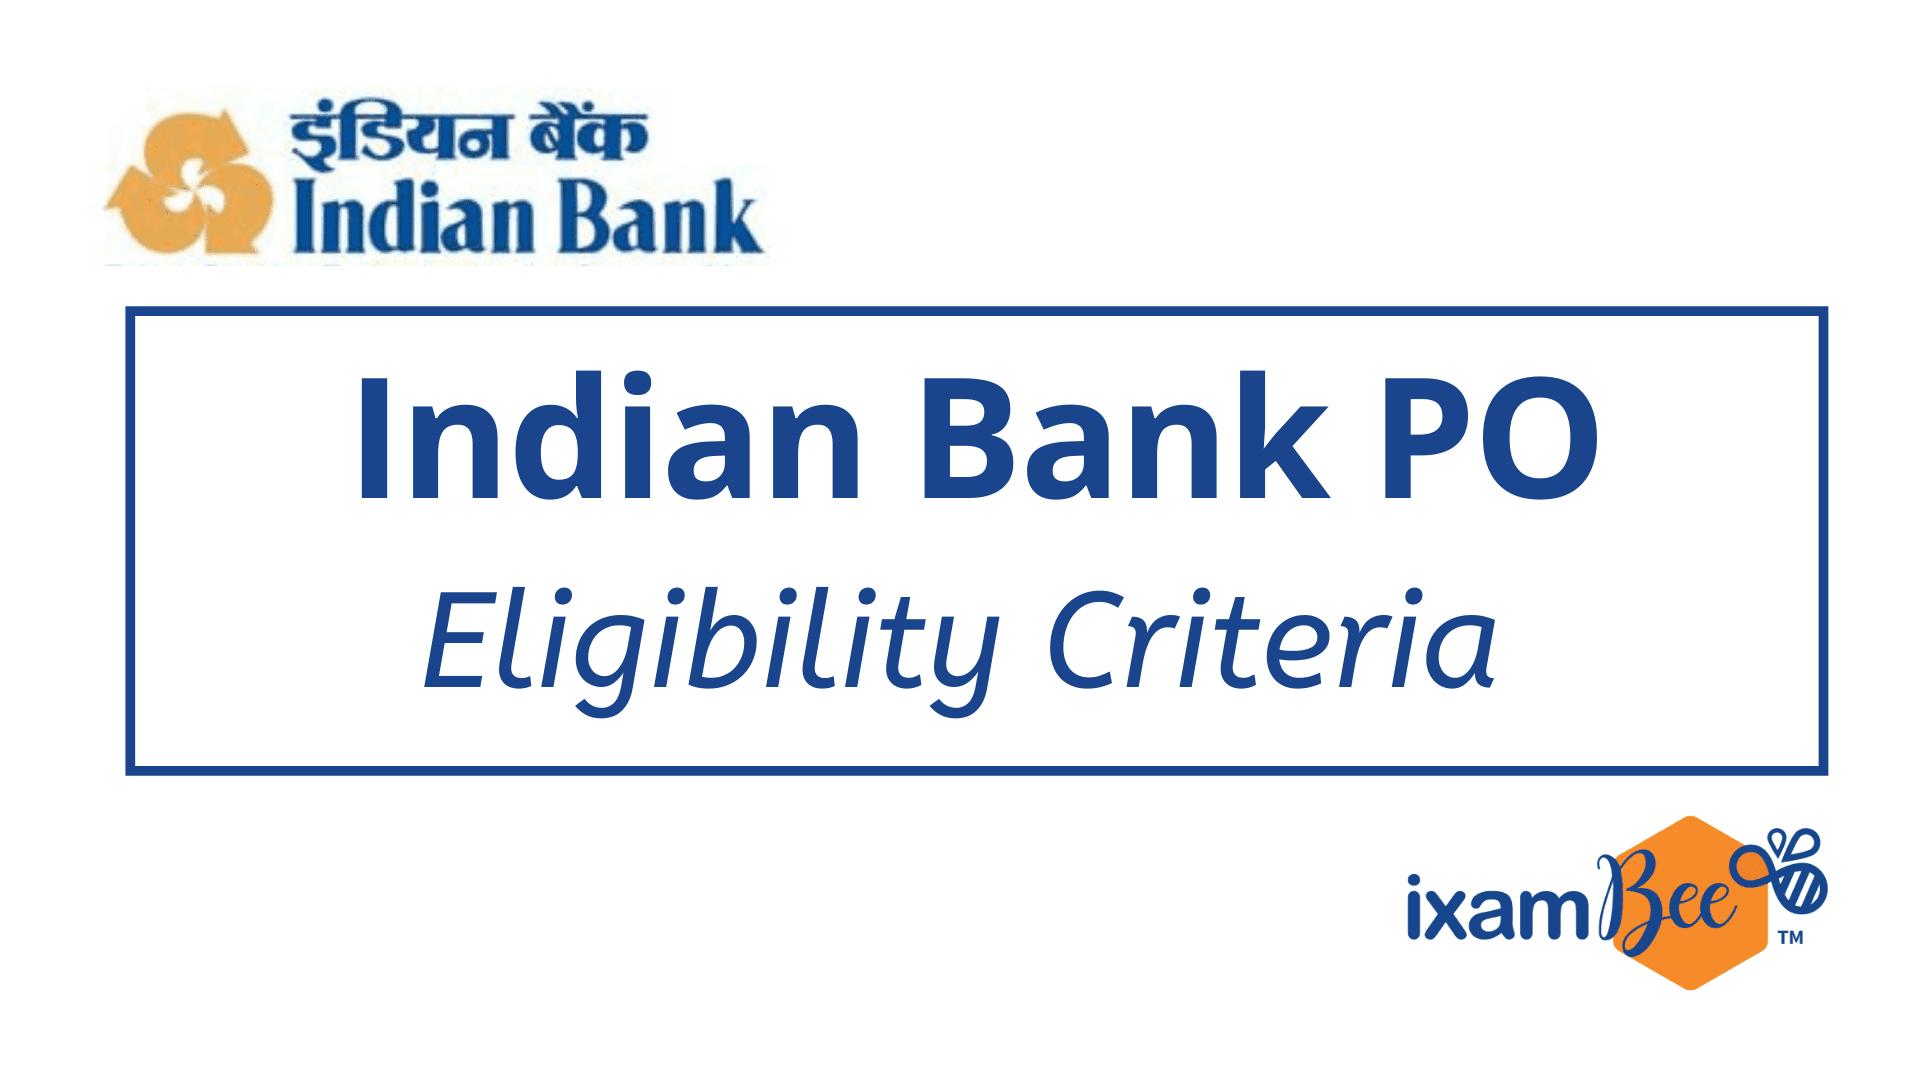 Indian Bank PO Eligibility Criteria